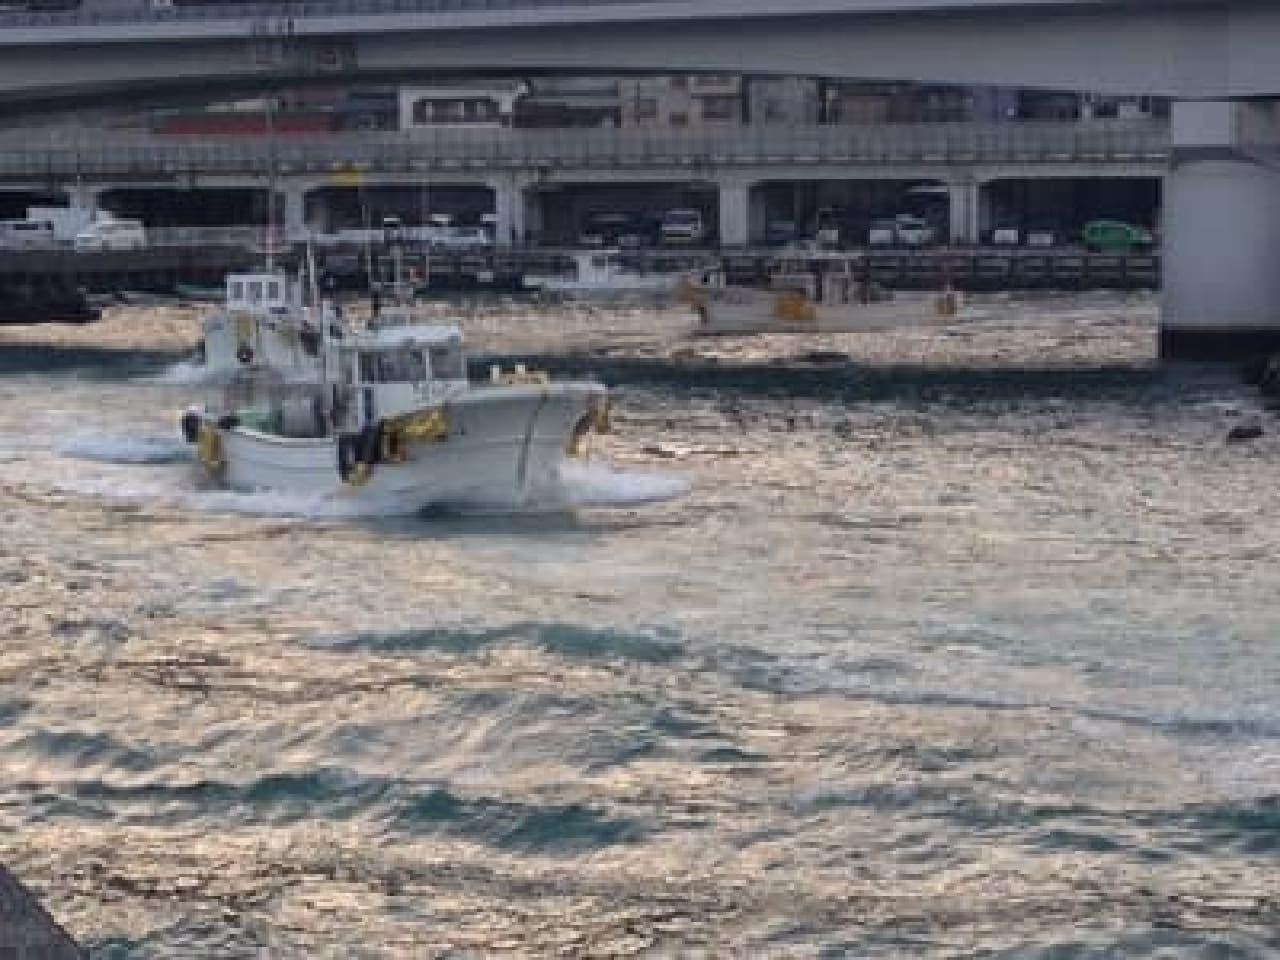 駿河湾産桜海老の漁